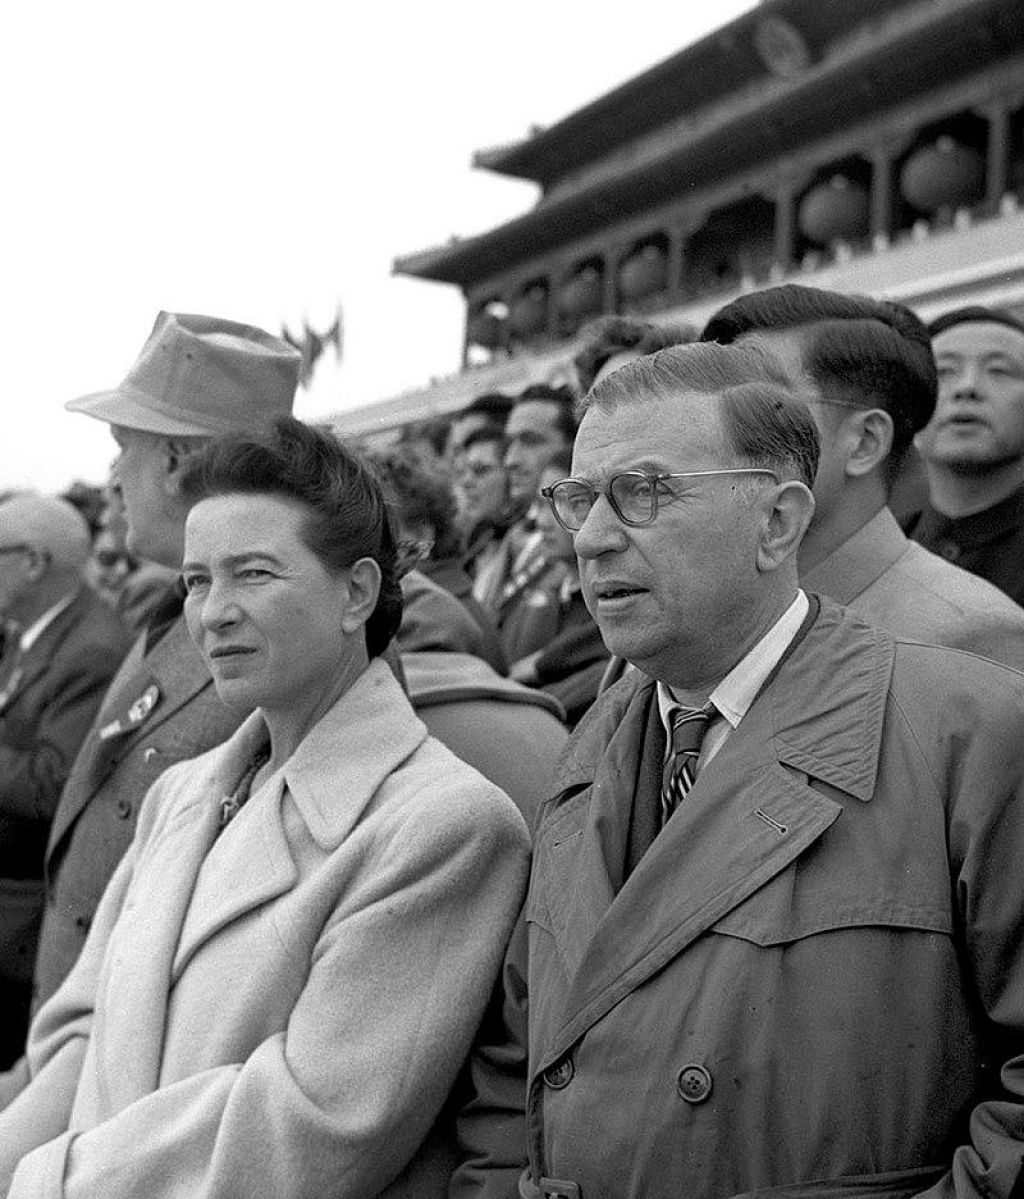 FOTO:Ko se je Sartre spogledoval z jastogi